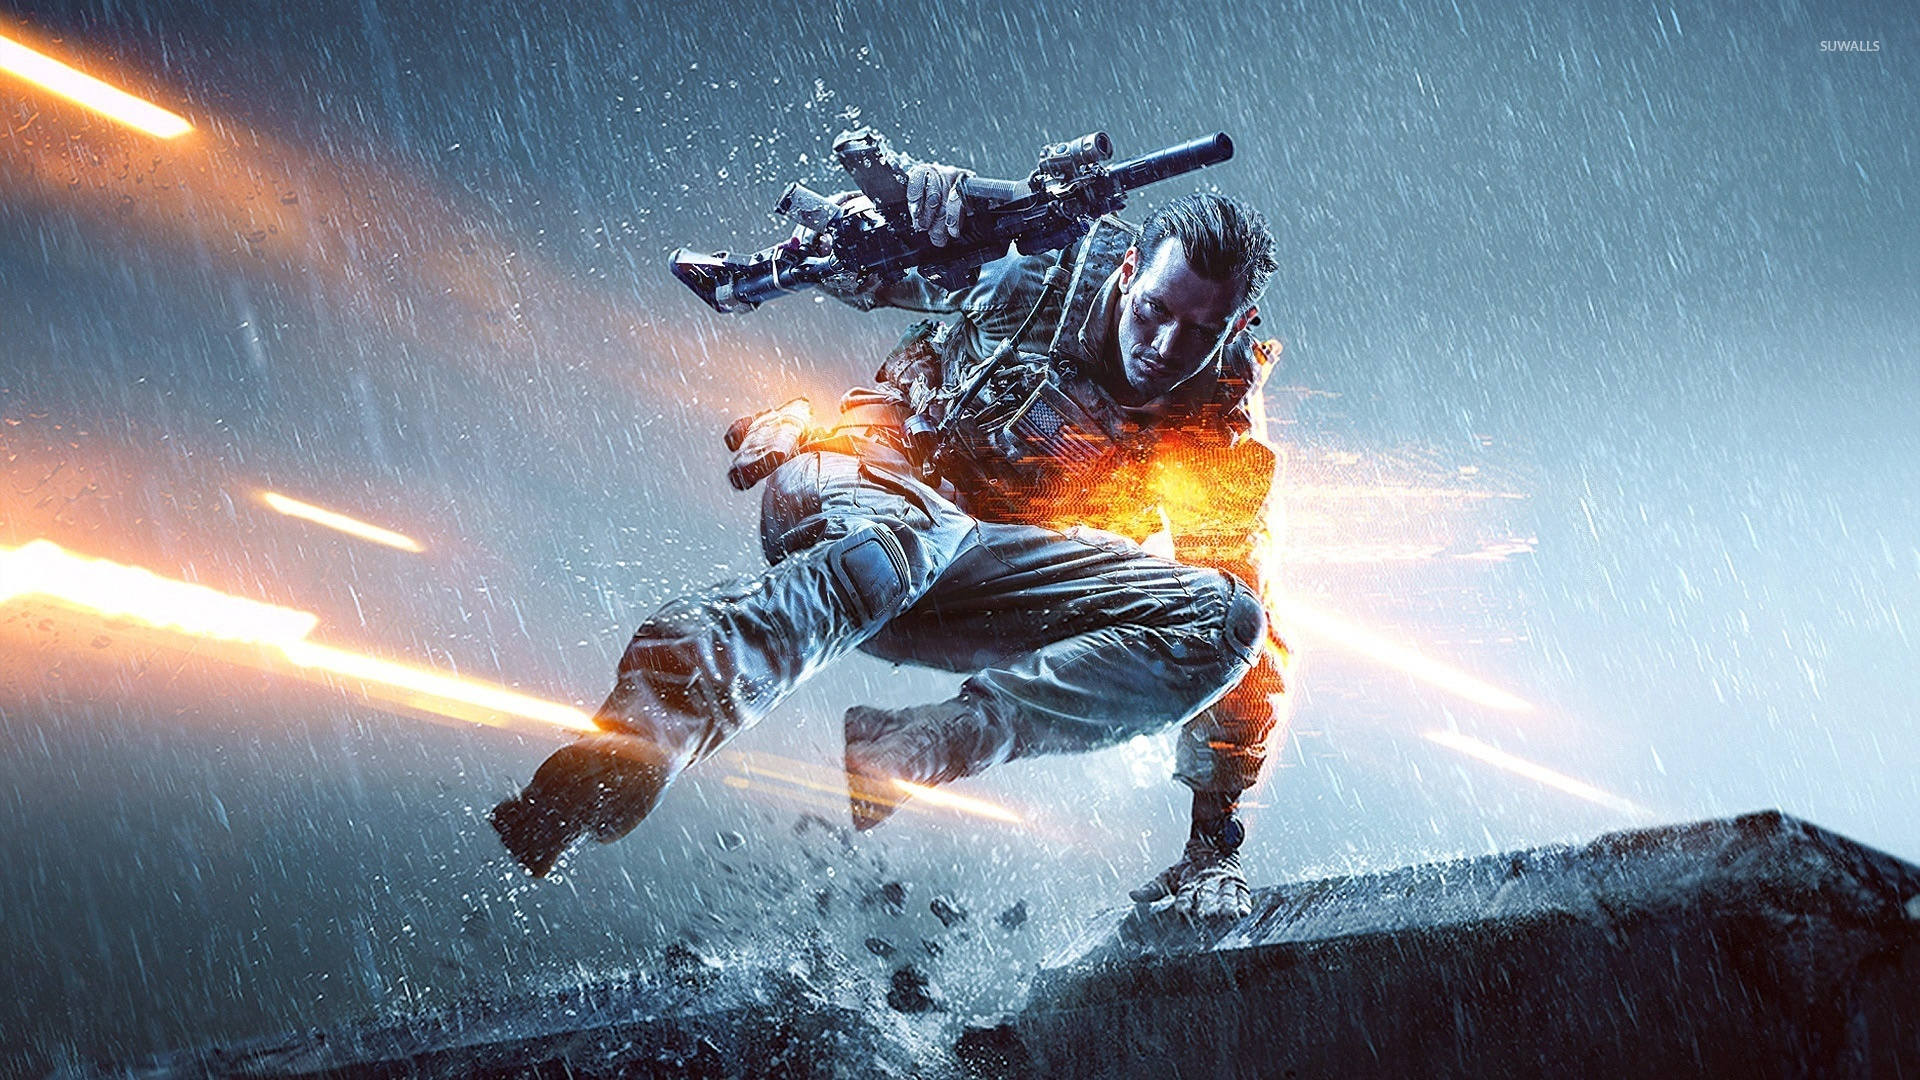 Battlefield 4 [3] wallpaper 1920x1080 jpg